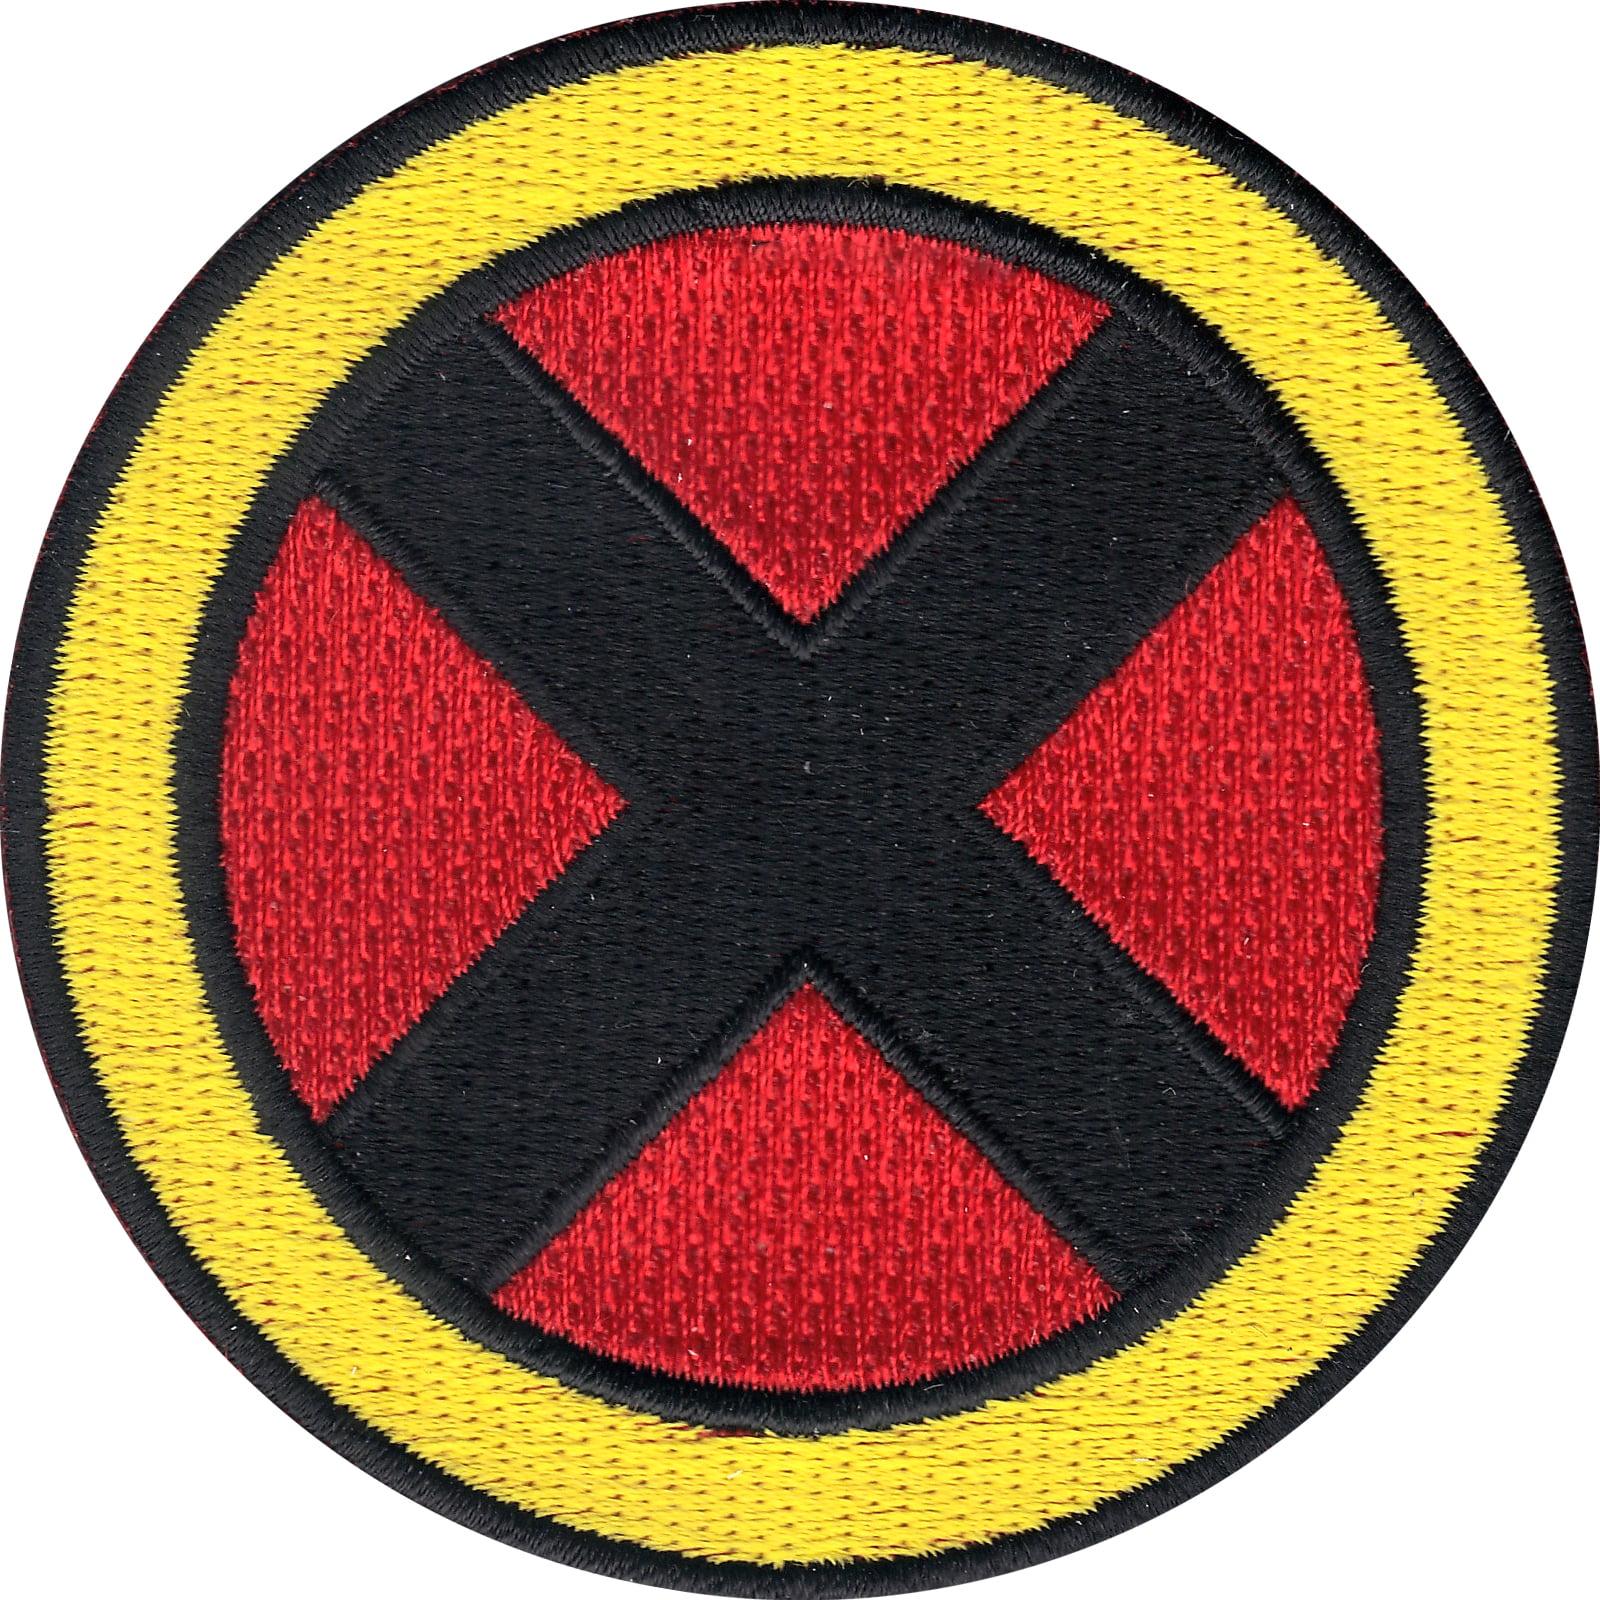 Marvel X-Men Wolverine Logo Iron on Patch